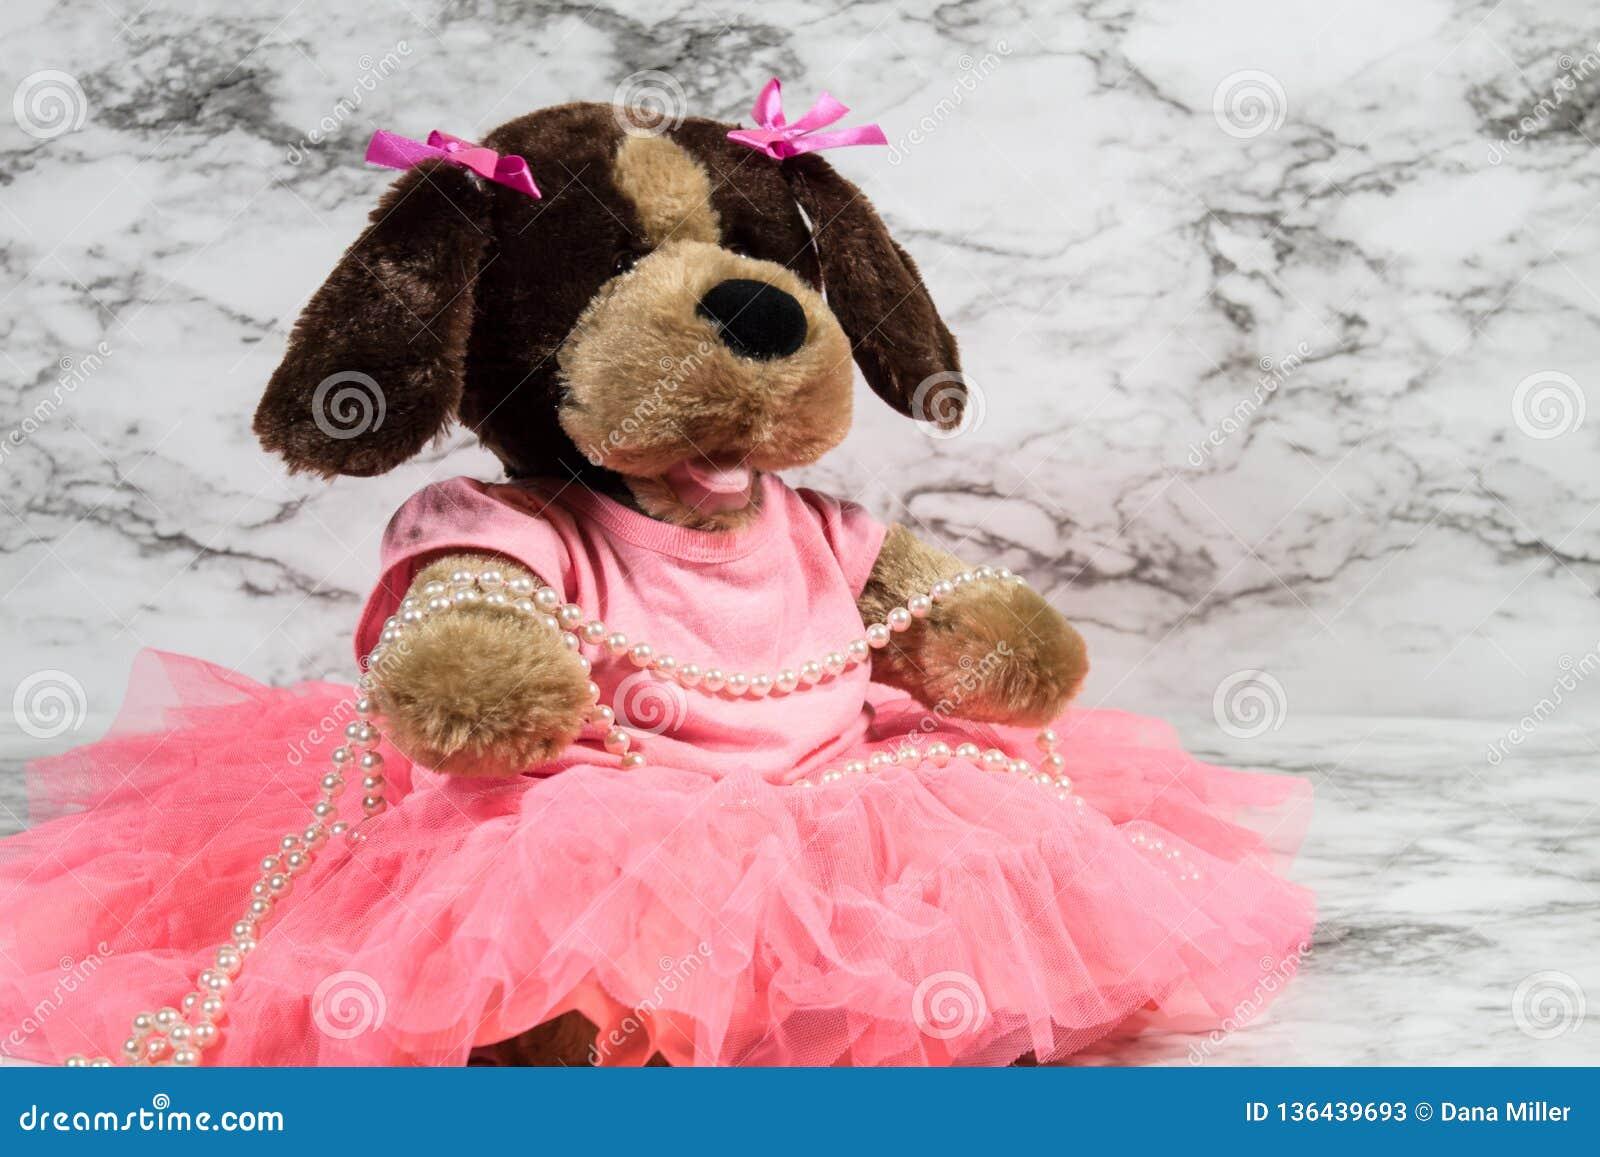 Stuffed Animal Dress Up Stock Image Image Of Tutu Jewelry 136439693